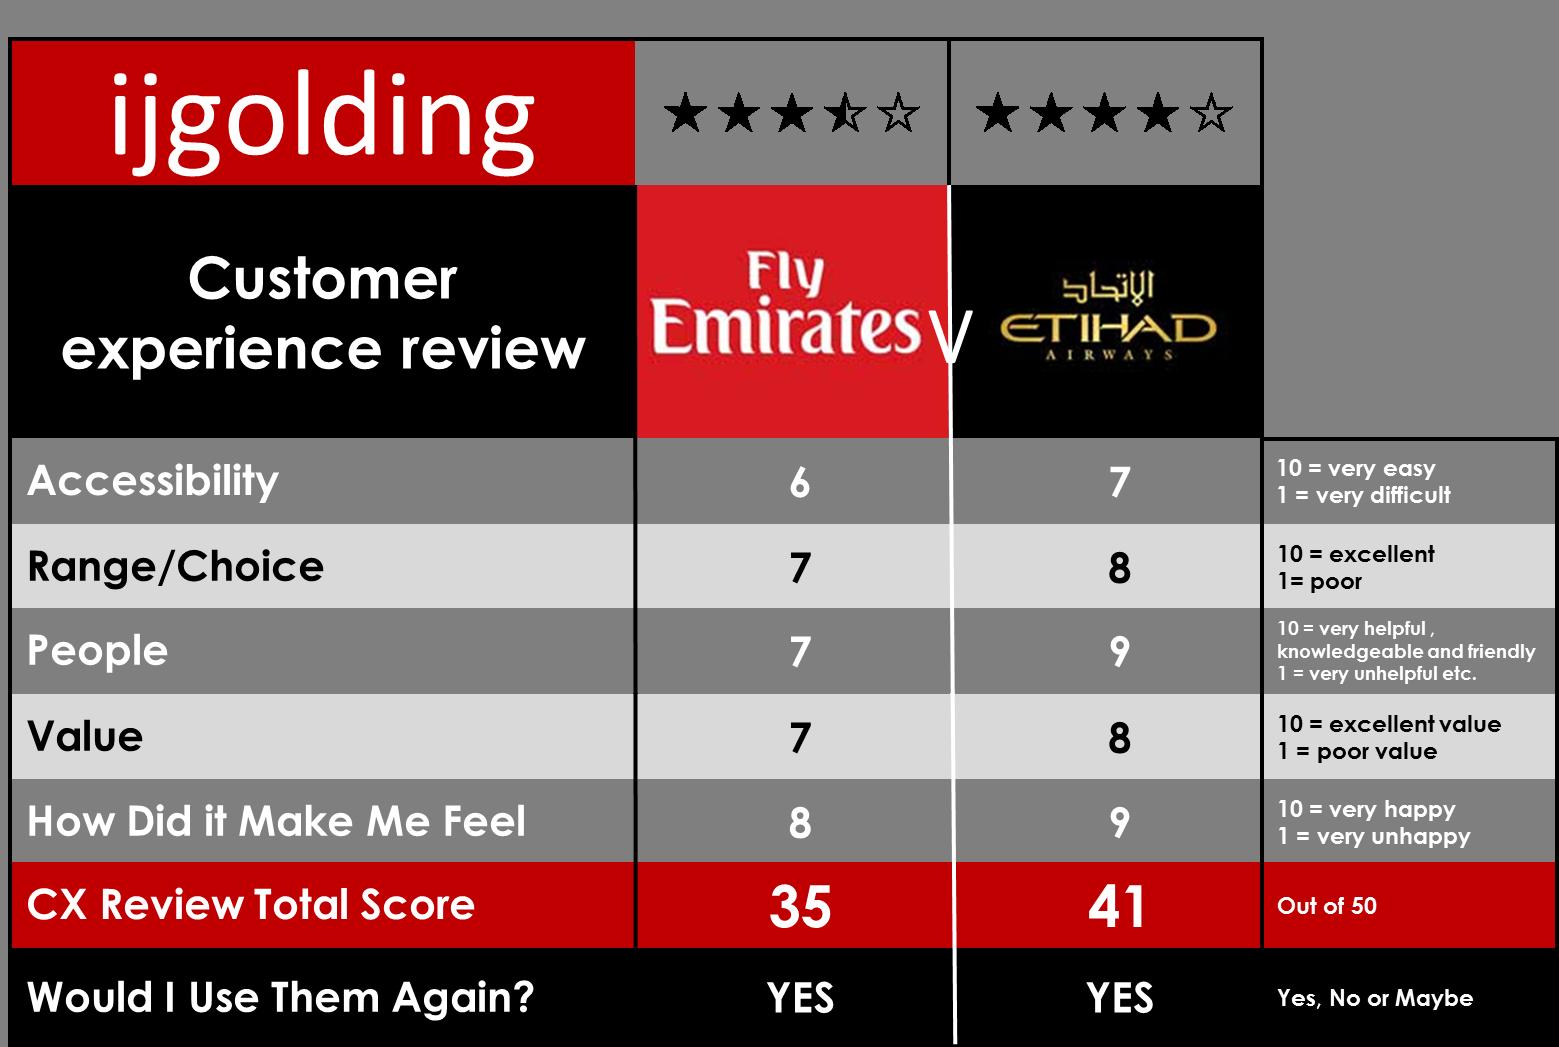 Emirates Vs Etihad Customer Experience Review I J Golding